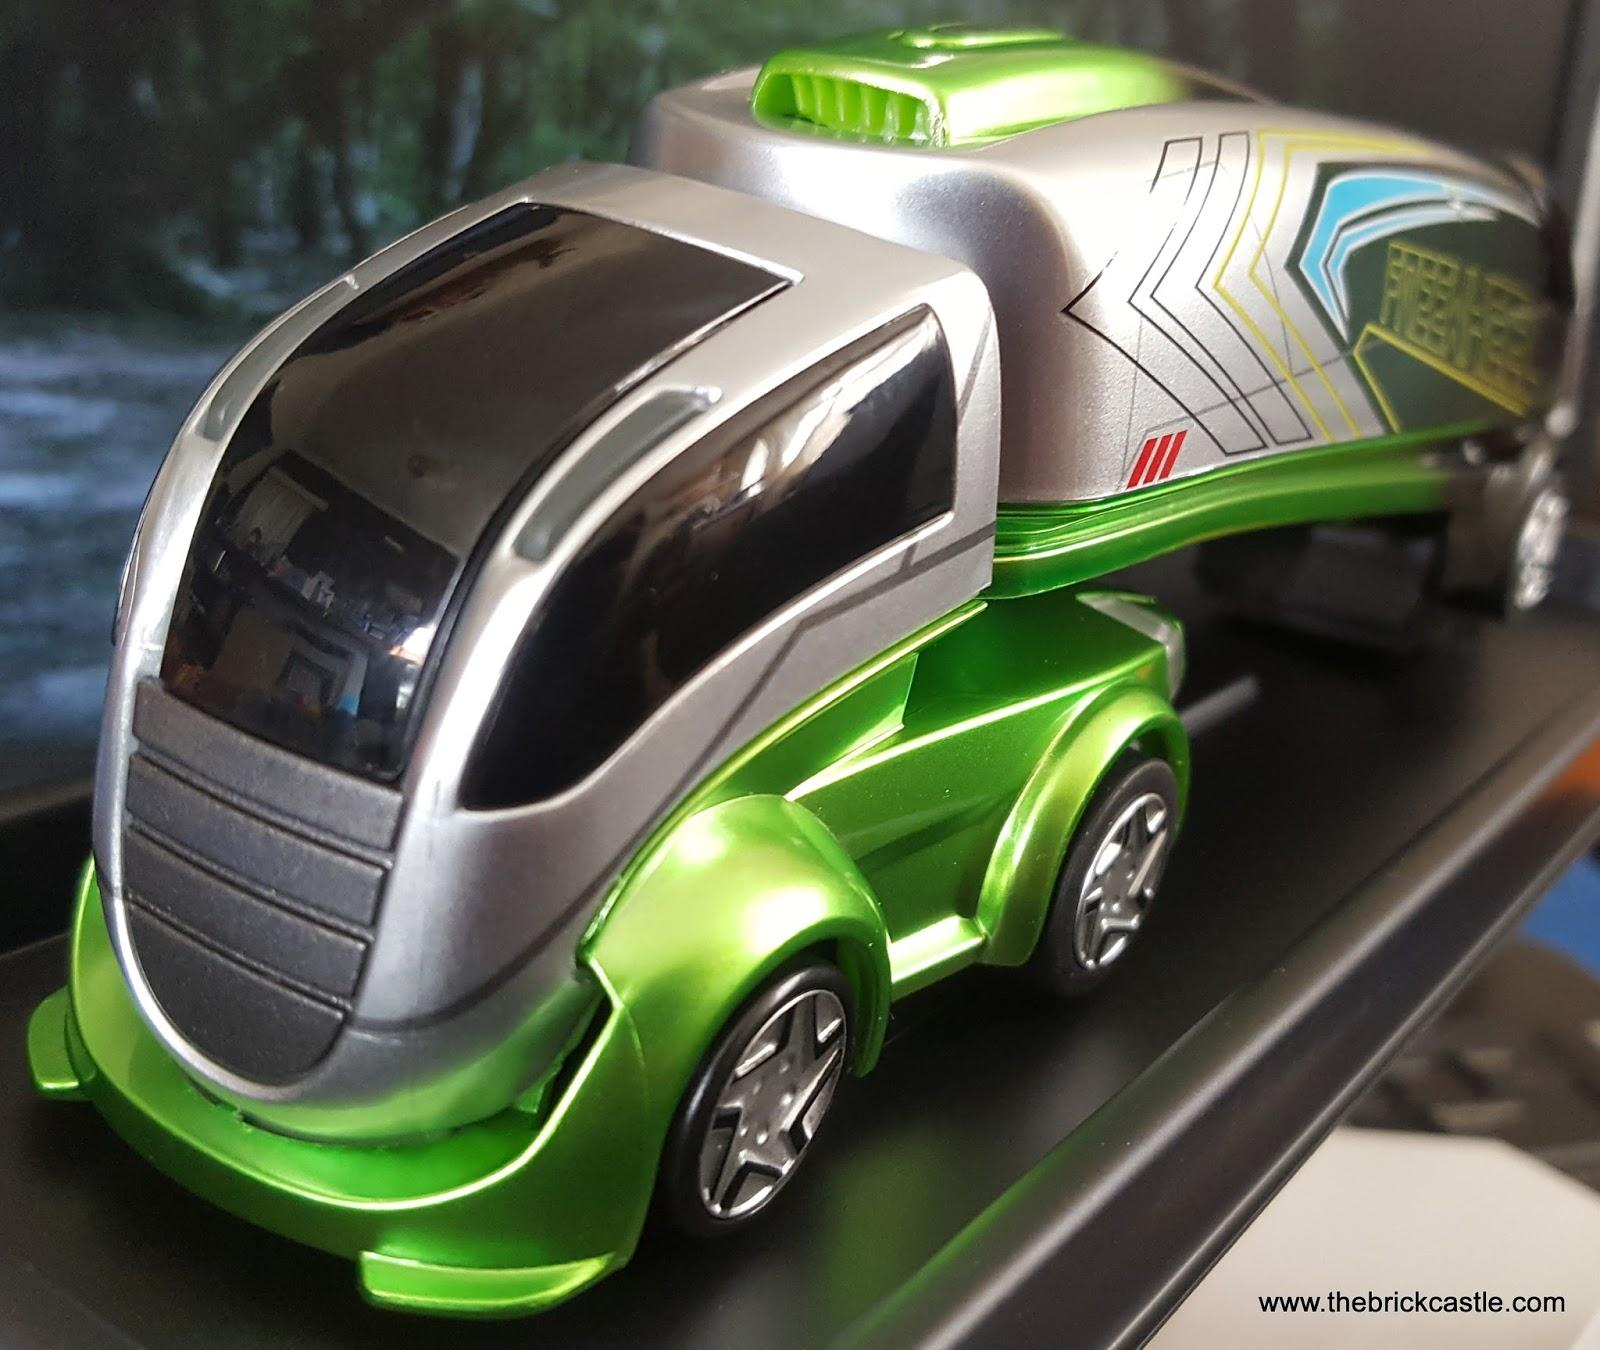 The Brick Castle: Anki OVERDRIVE Robotic Supercar Racing